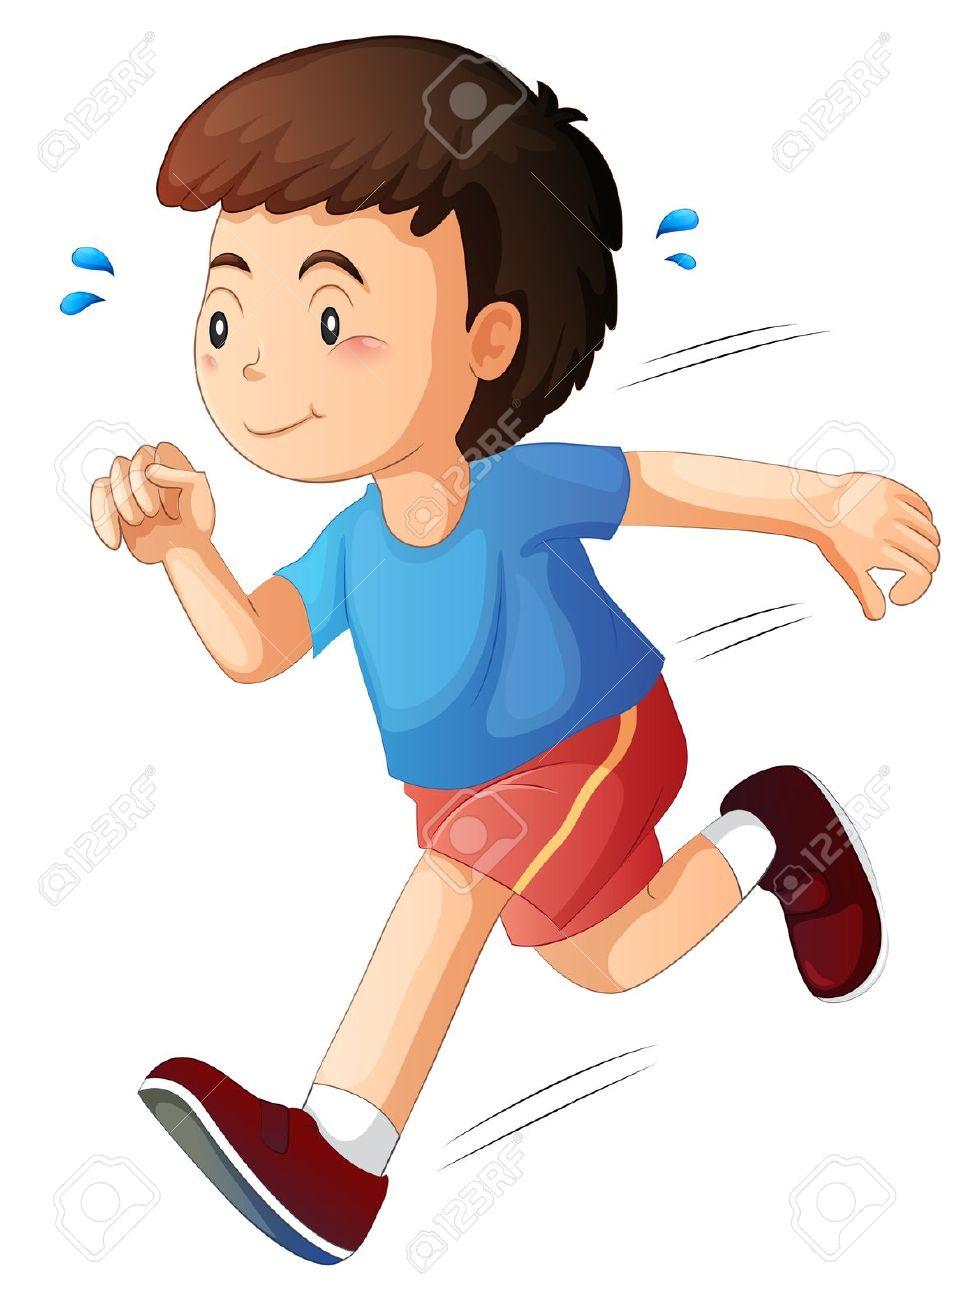 Run Clipart & Run Clip Art Images.